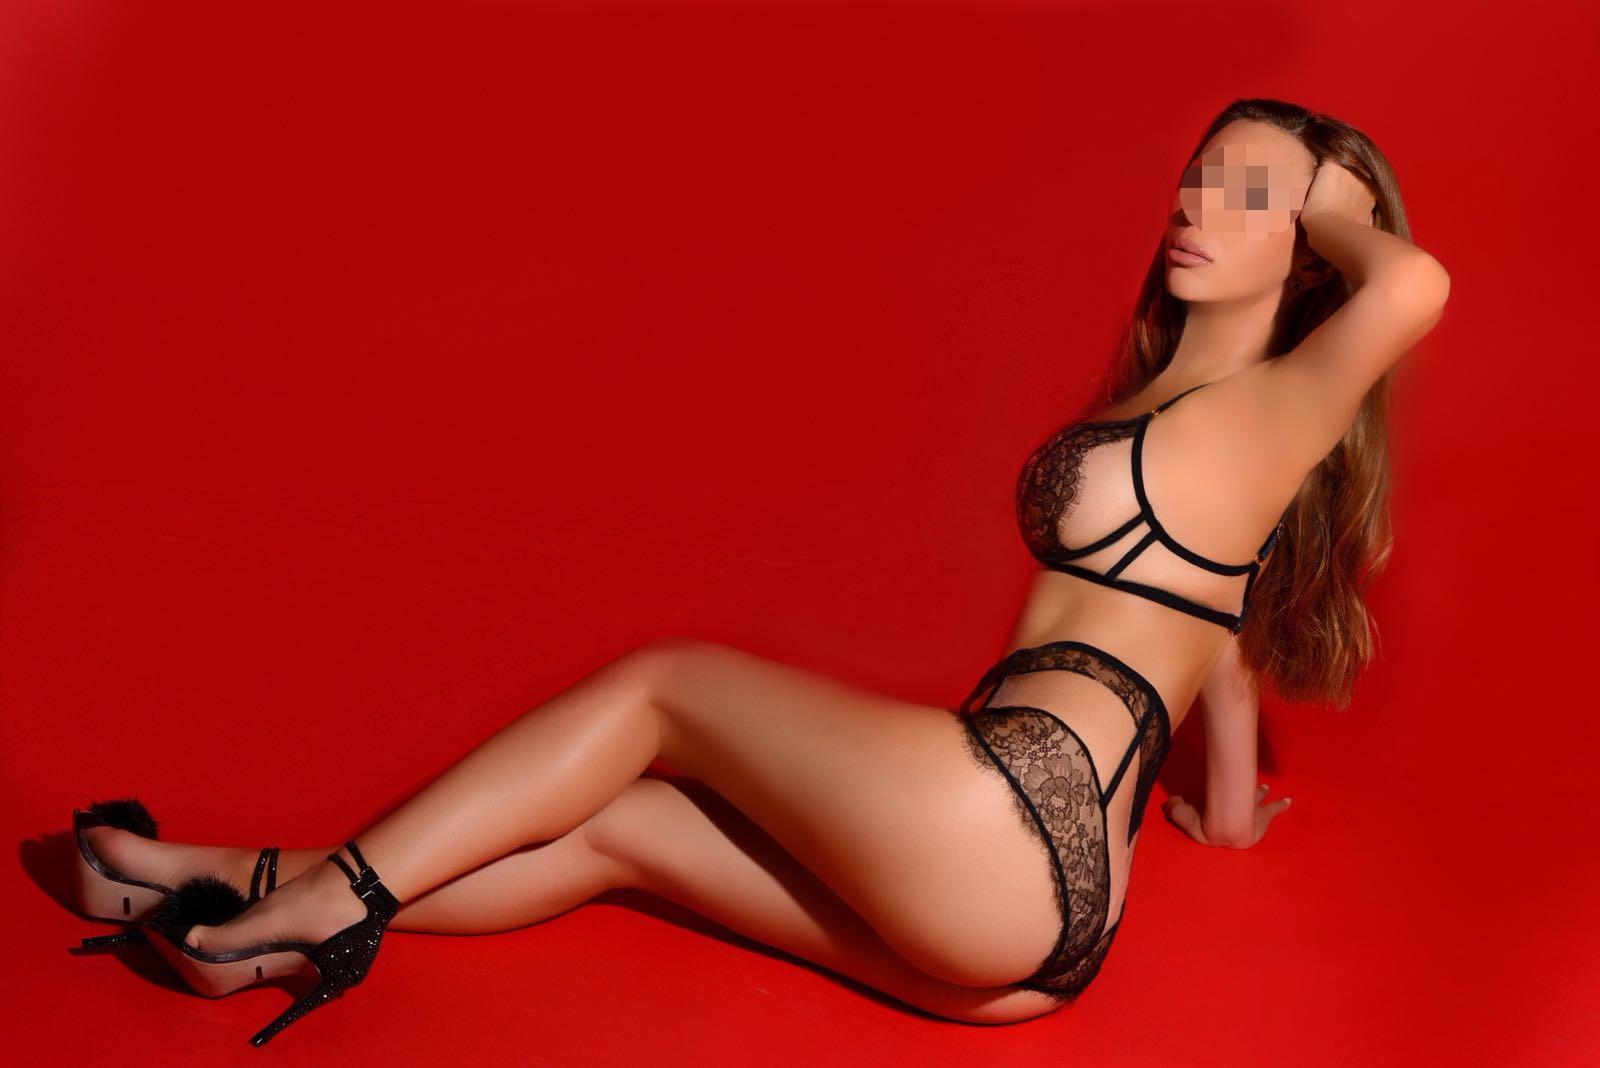 Alexis from Cinderella Escorts